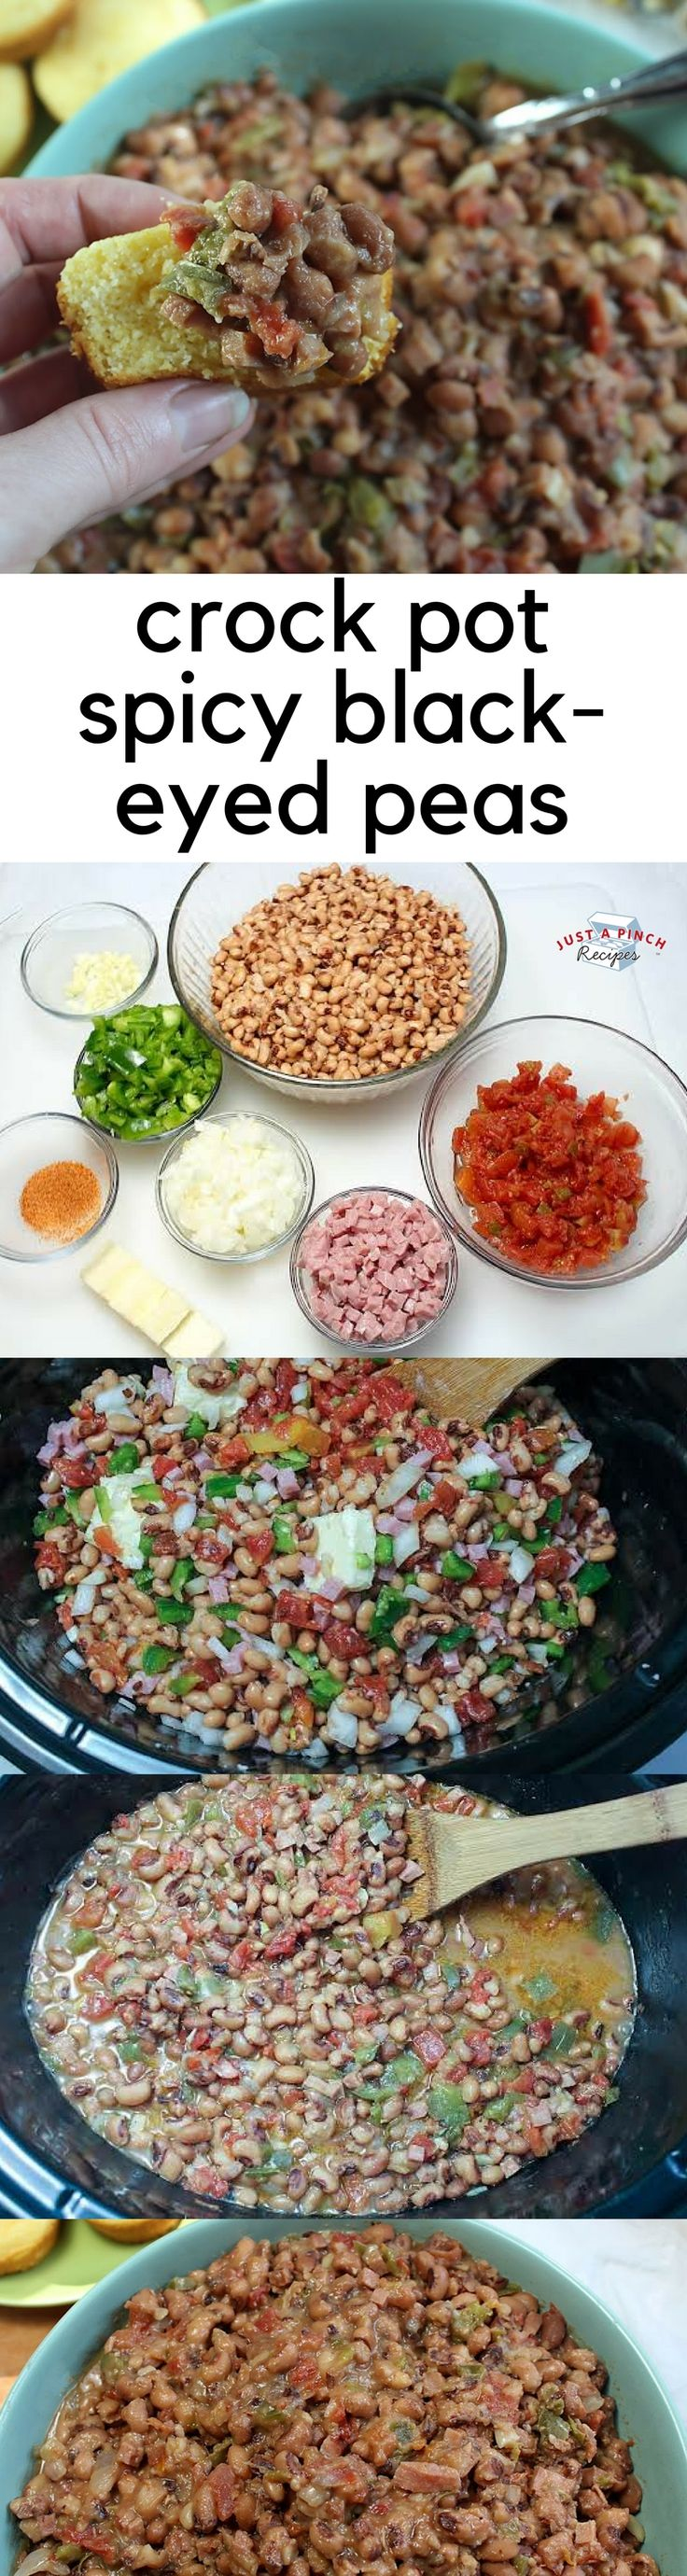 Crock pot black-eyed peas recipe is a must-make for New Year's Day! #crockpot #crockpotrecipes #blackeyedpeas #newyearsrecipes